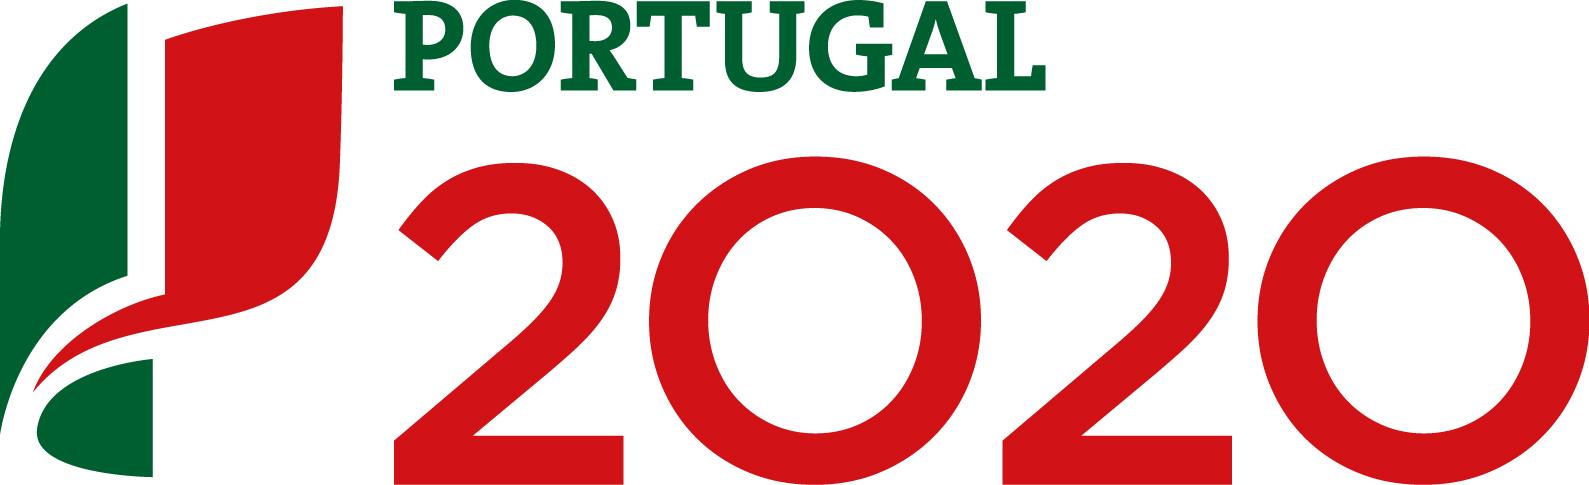 logo portugal 2020 cores fundos europeus